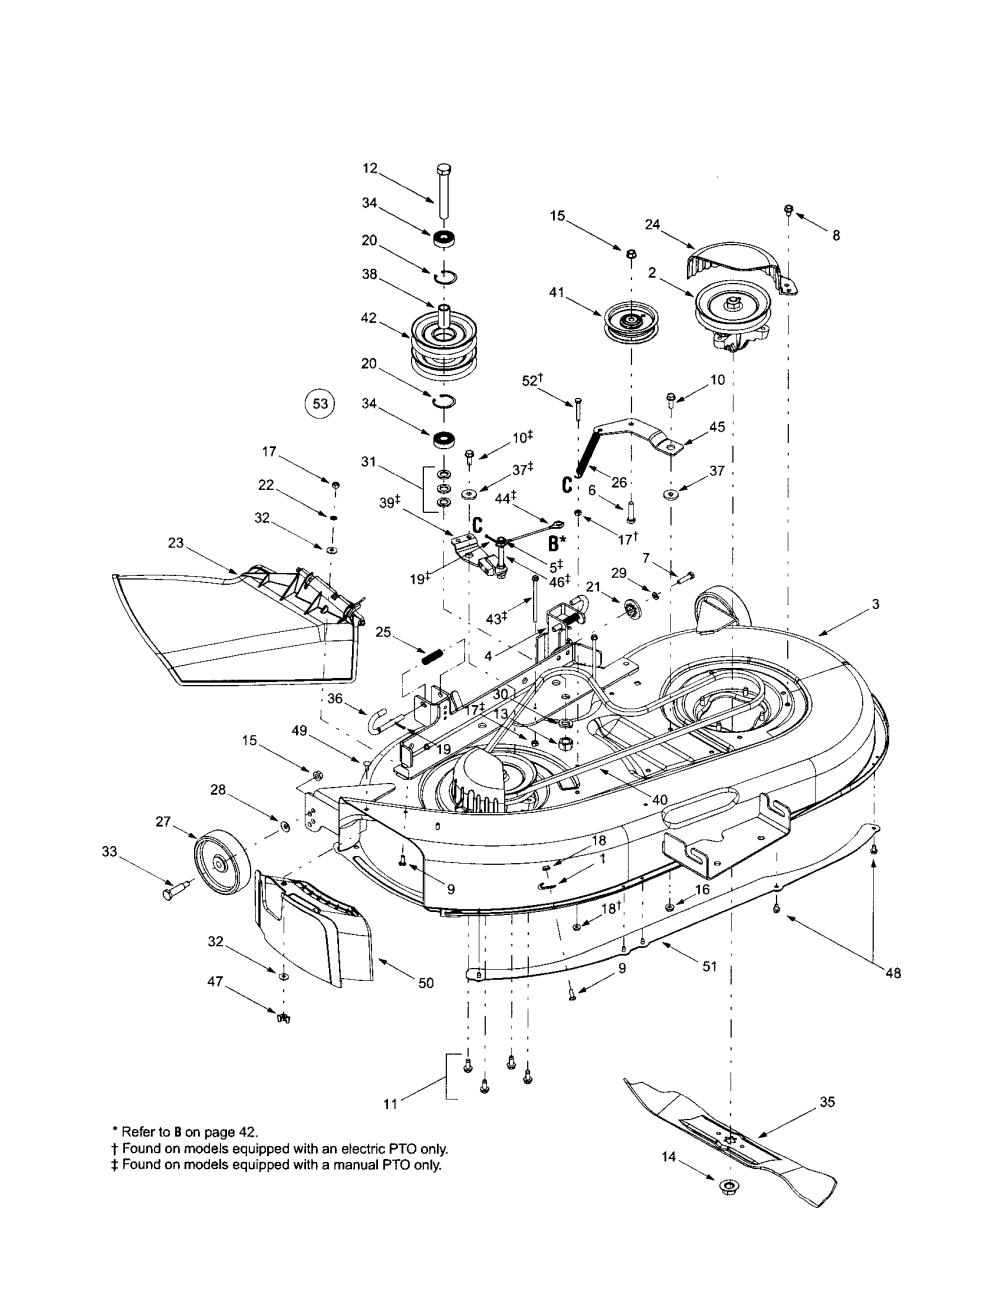 medium resolution of mtd 38 mower deck diagram furthermore mtd snowblower parts diagram looking for mtd model 609 front